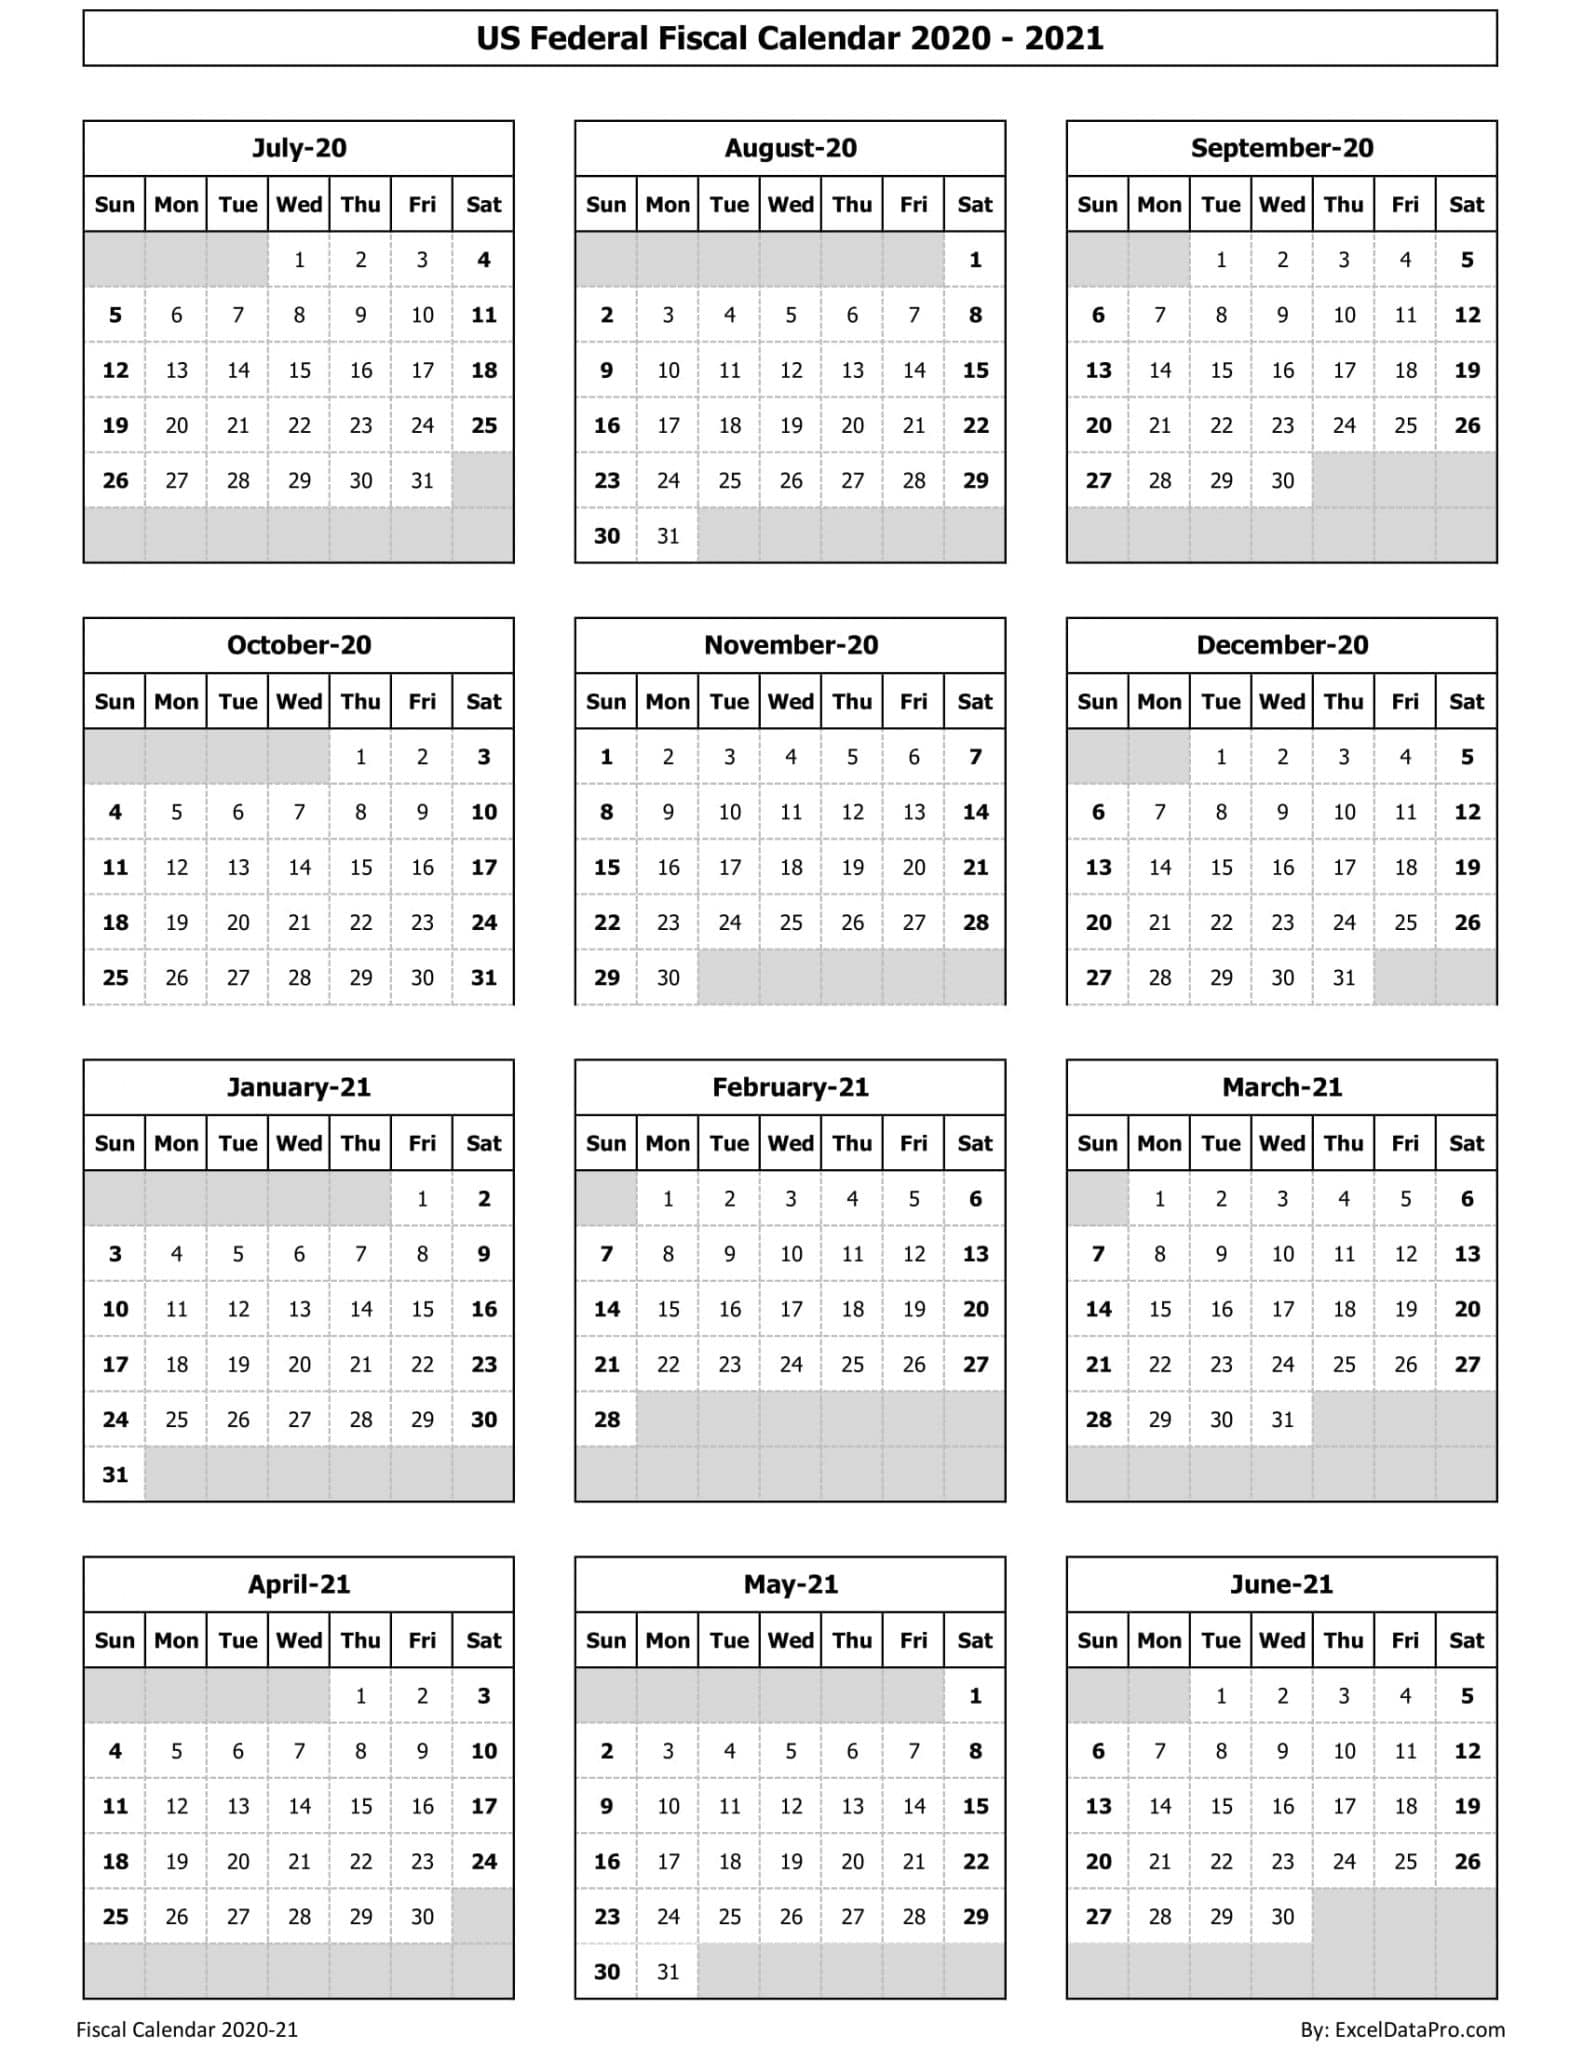 US FedUS Federal Fiscal Calendar 2020-21 - Ink Savereral Fiscal Calendar 2020-21